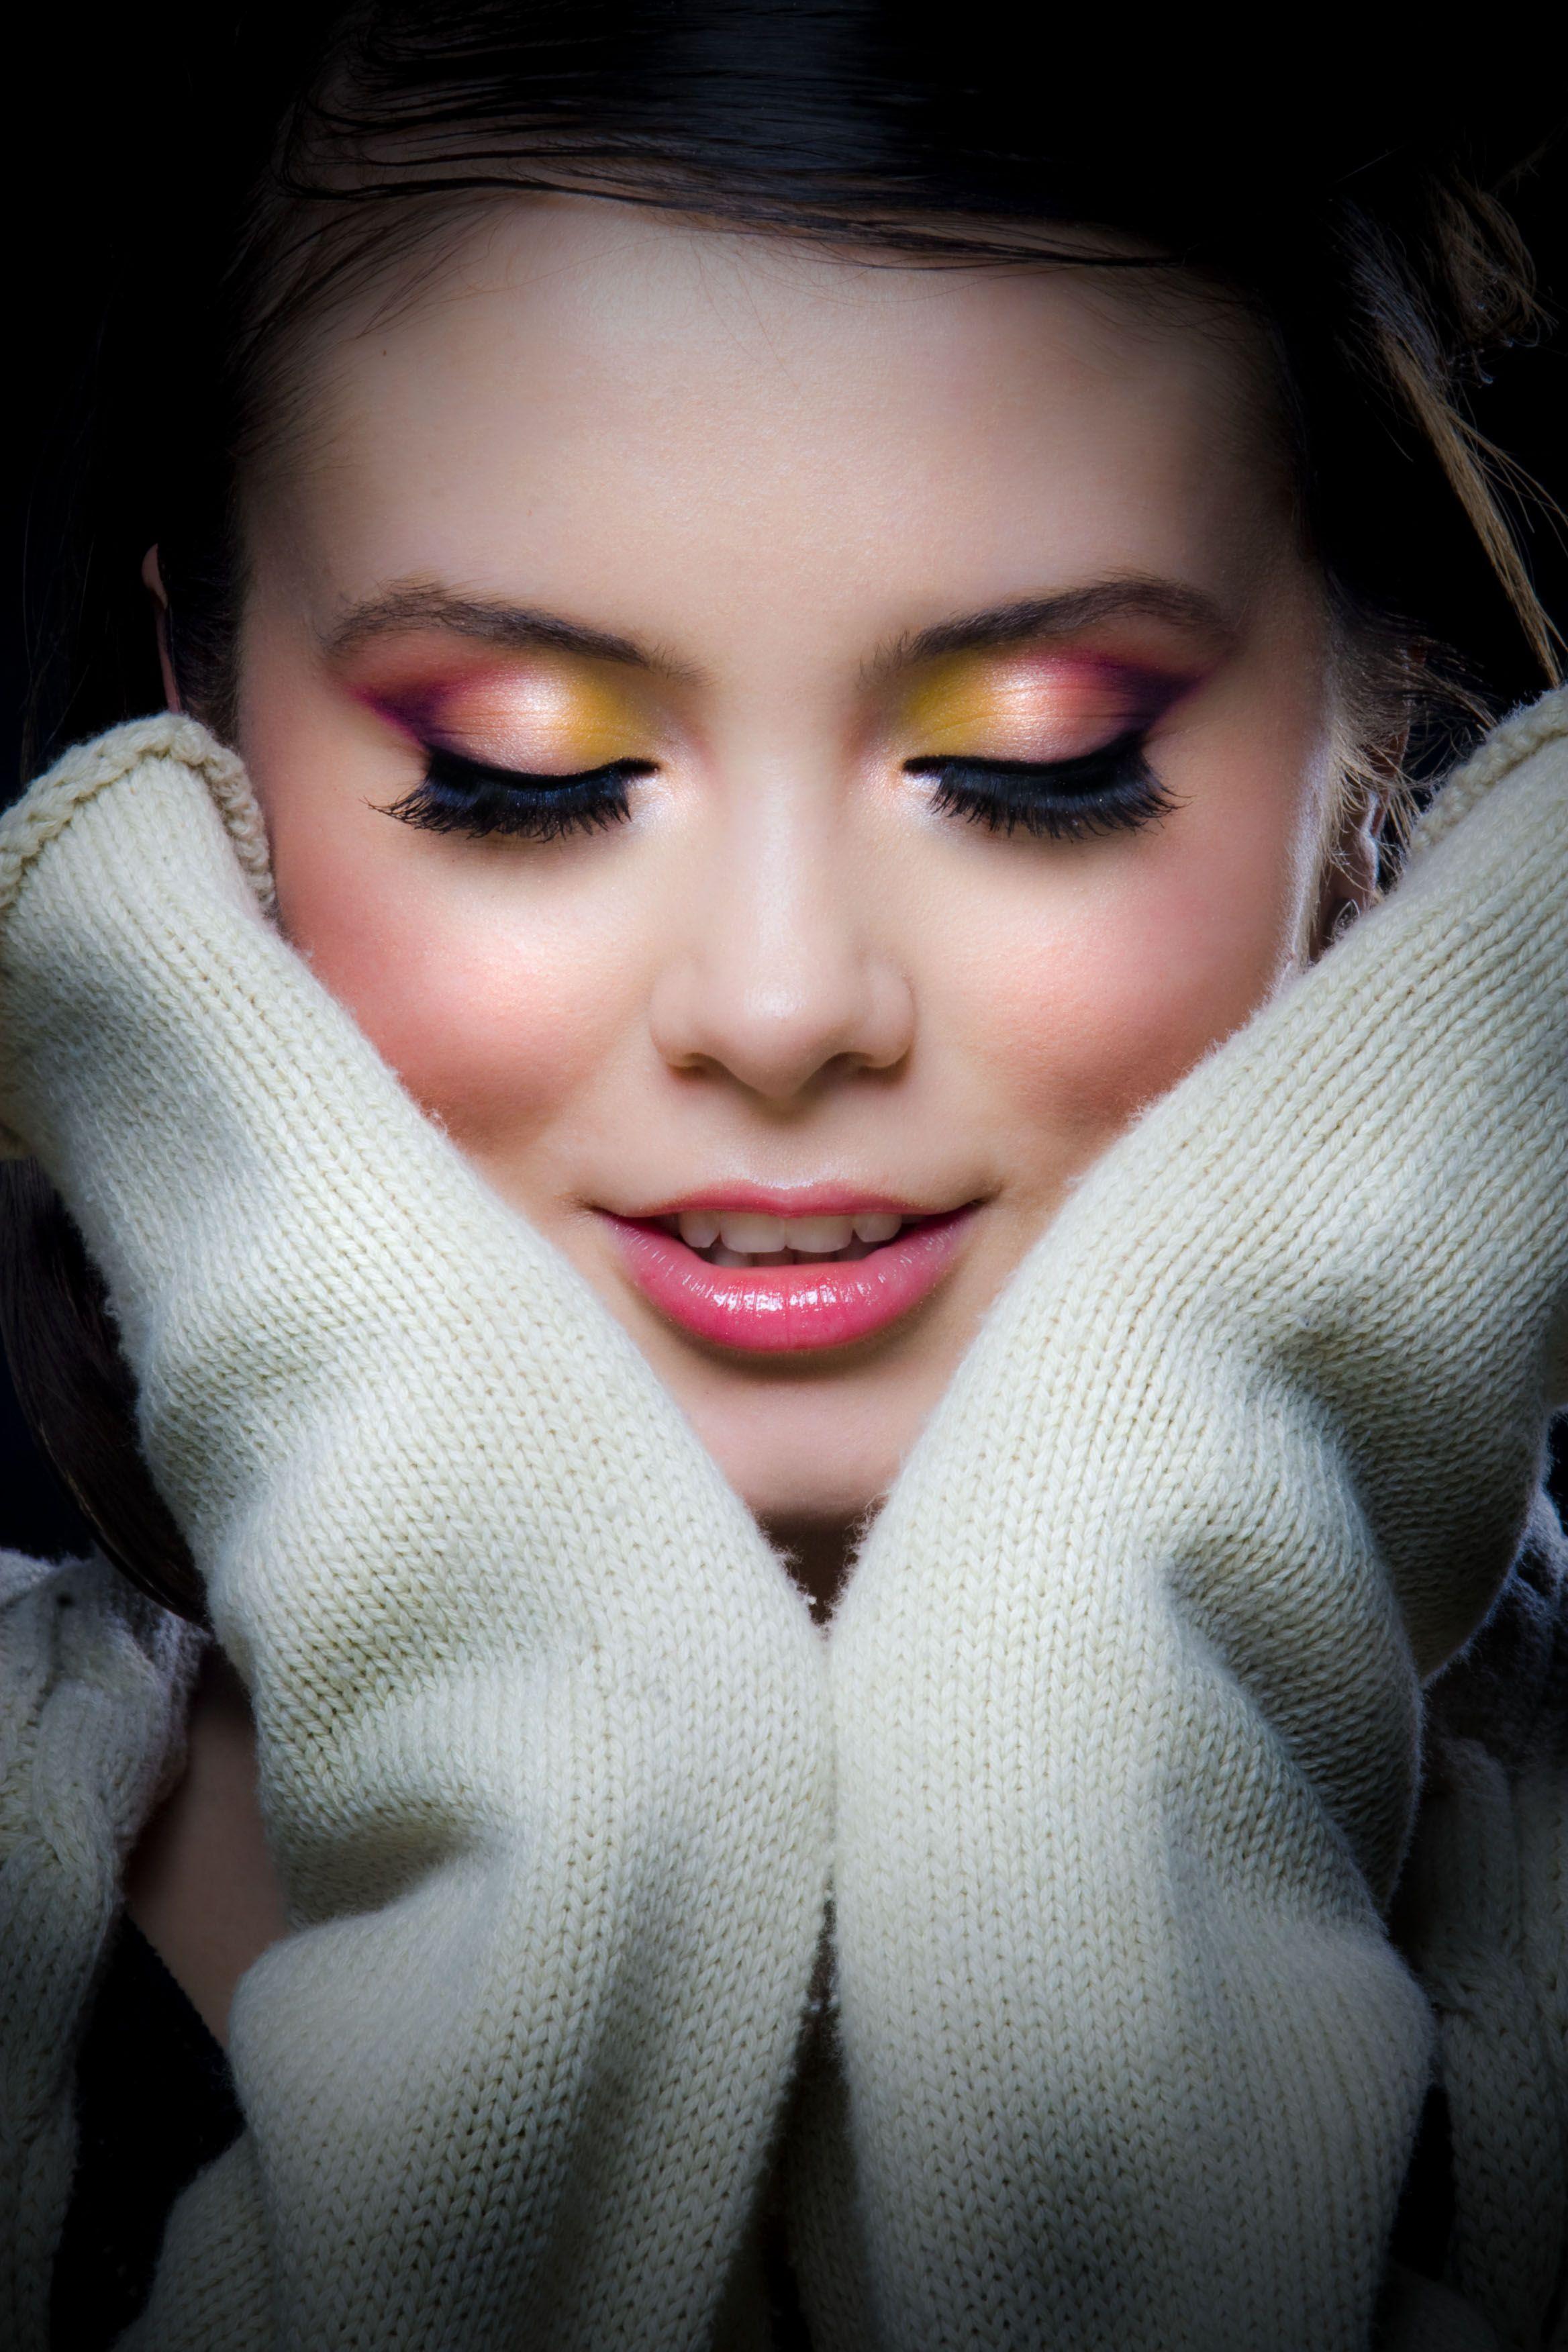 Anca Dumitra photographer: florin constantin model: anca dumitra hair